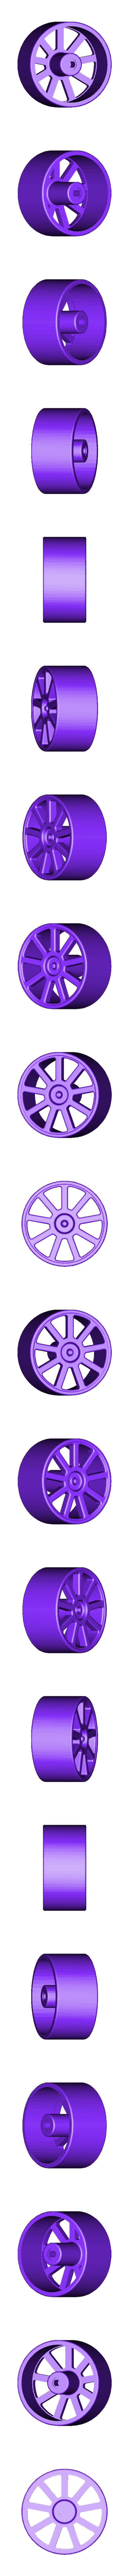 Rueda_lisa_para_motoreductor_en_stl.STL Download free STL file Smooth Wheel for Motor Reducer • 3D printable template, memoretirado